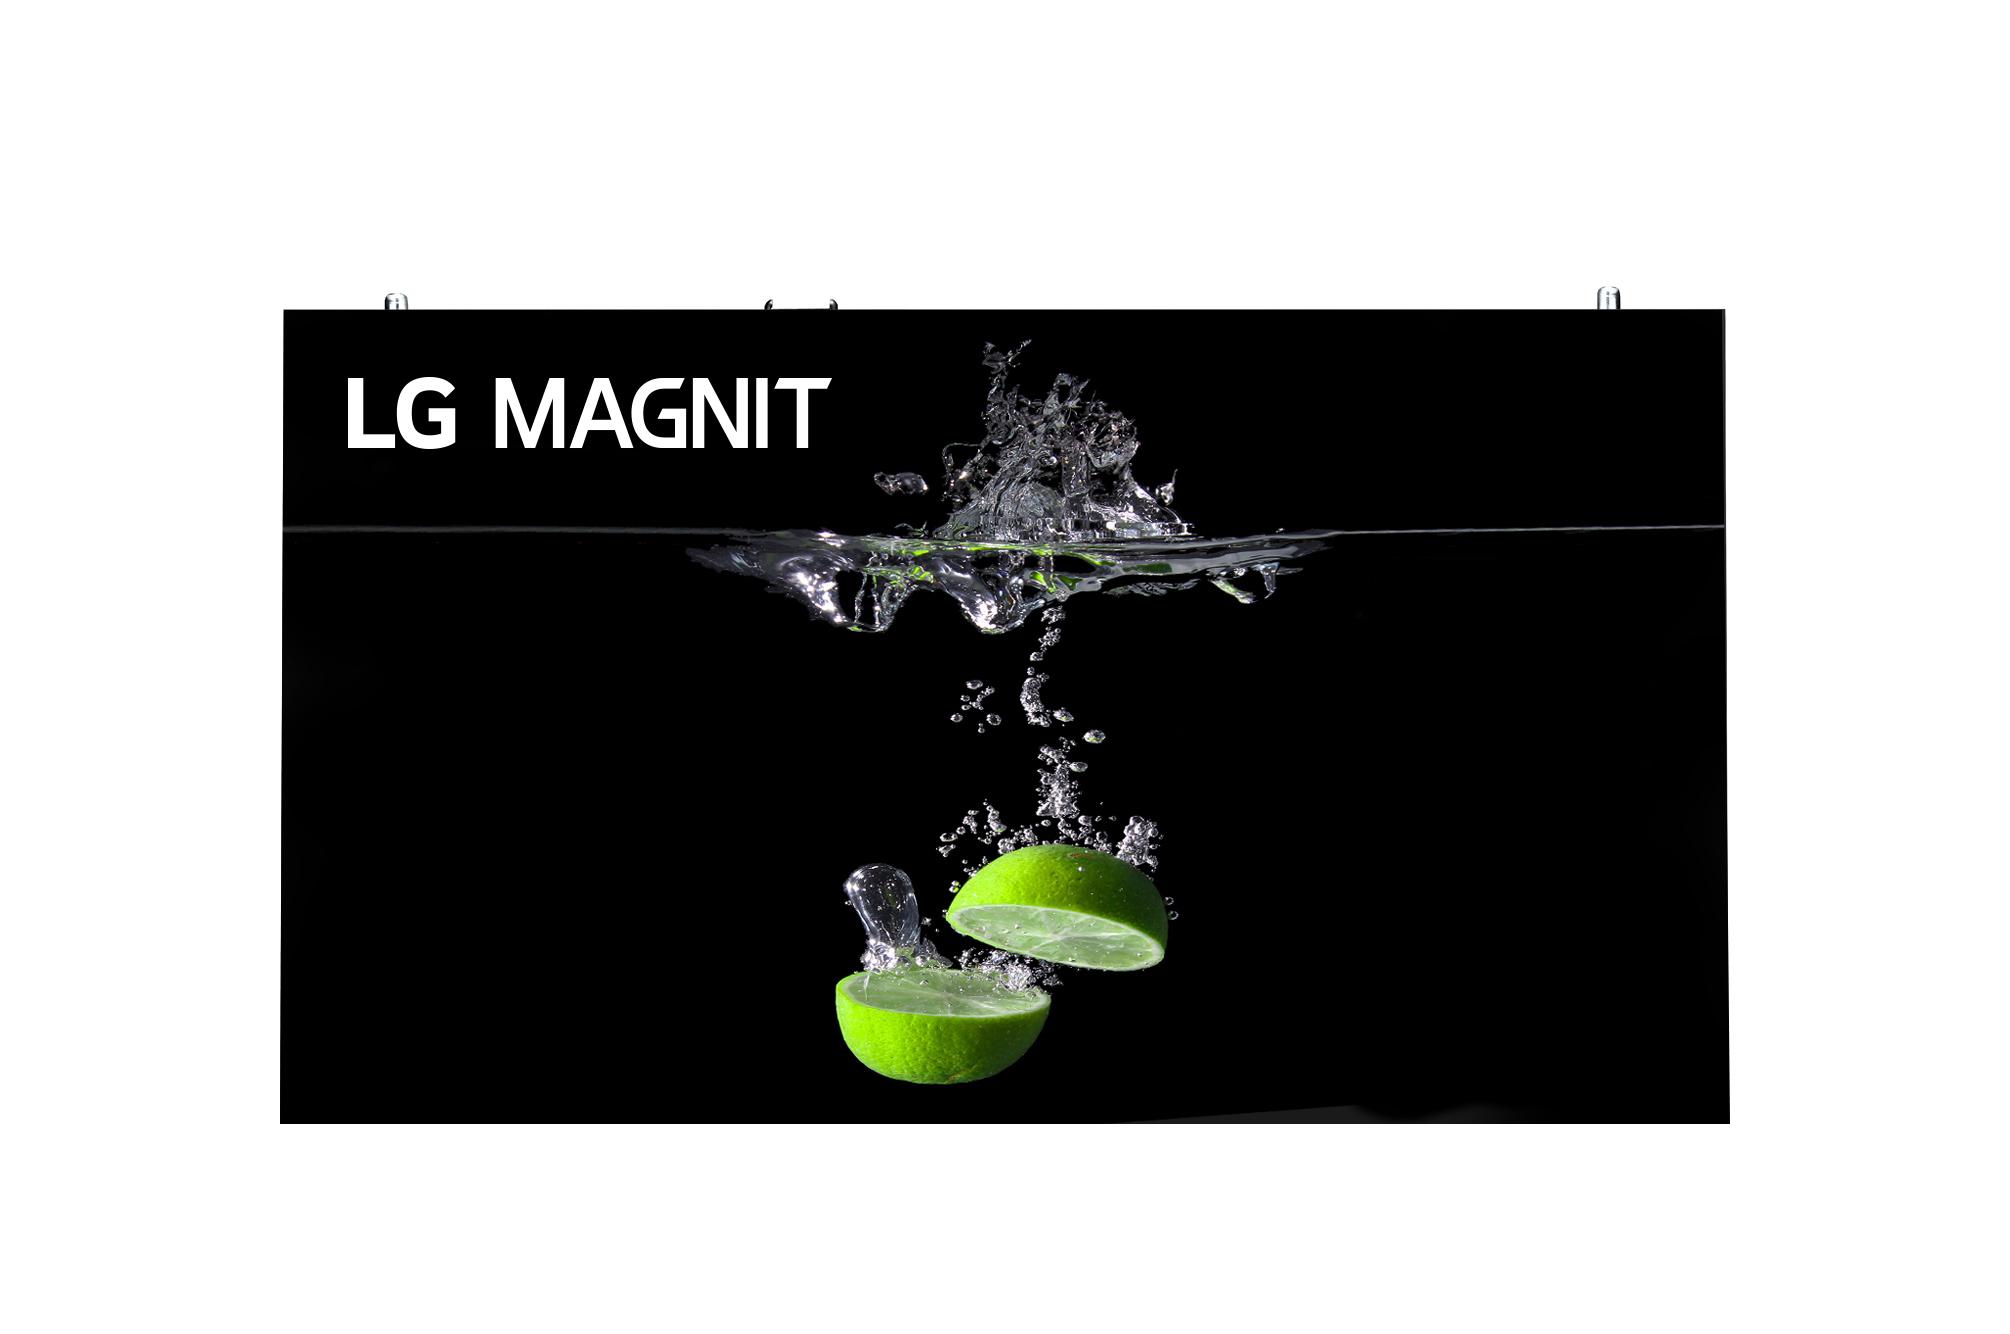 LG LG MAGNIT LSAB009 1